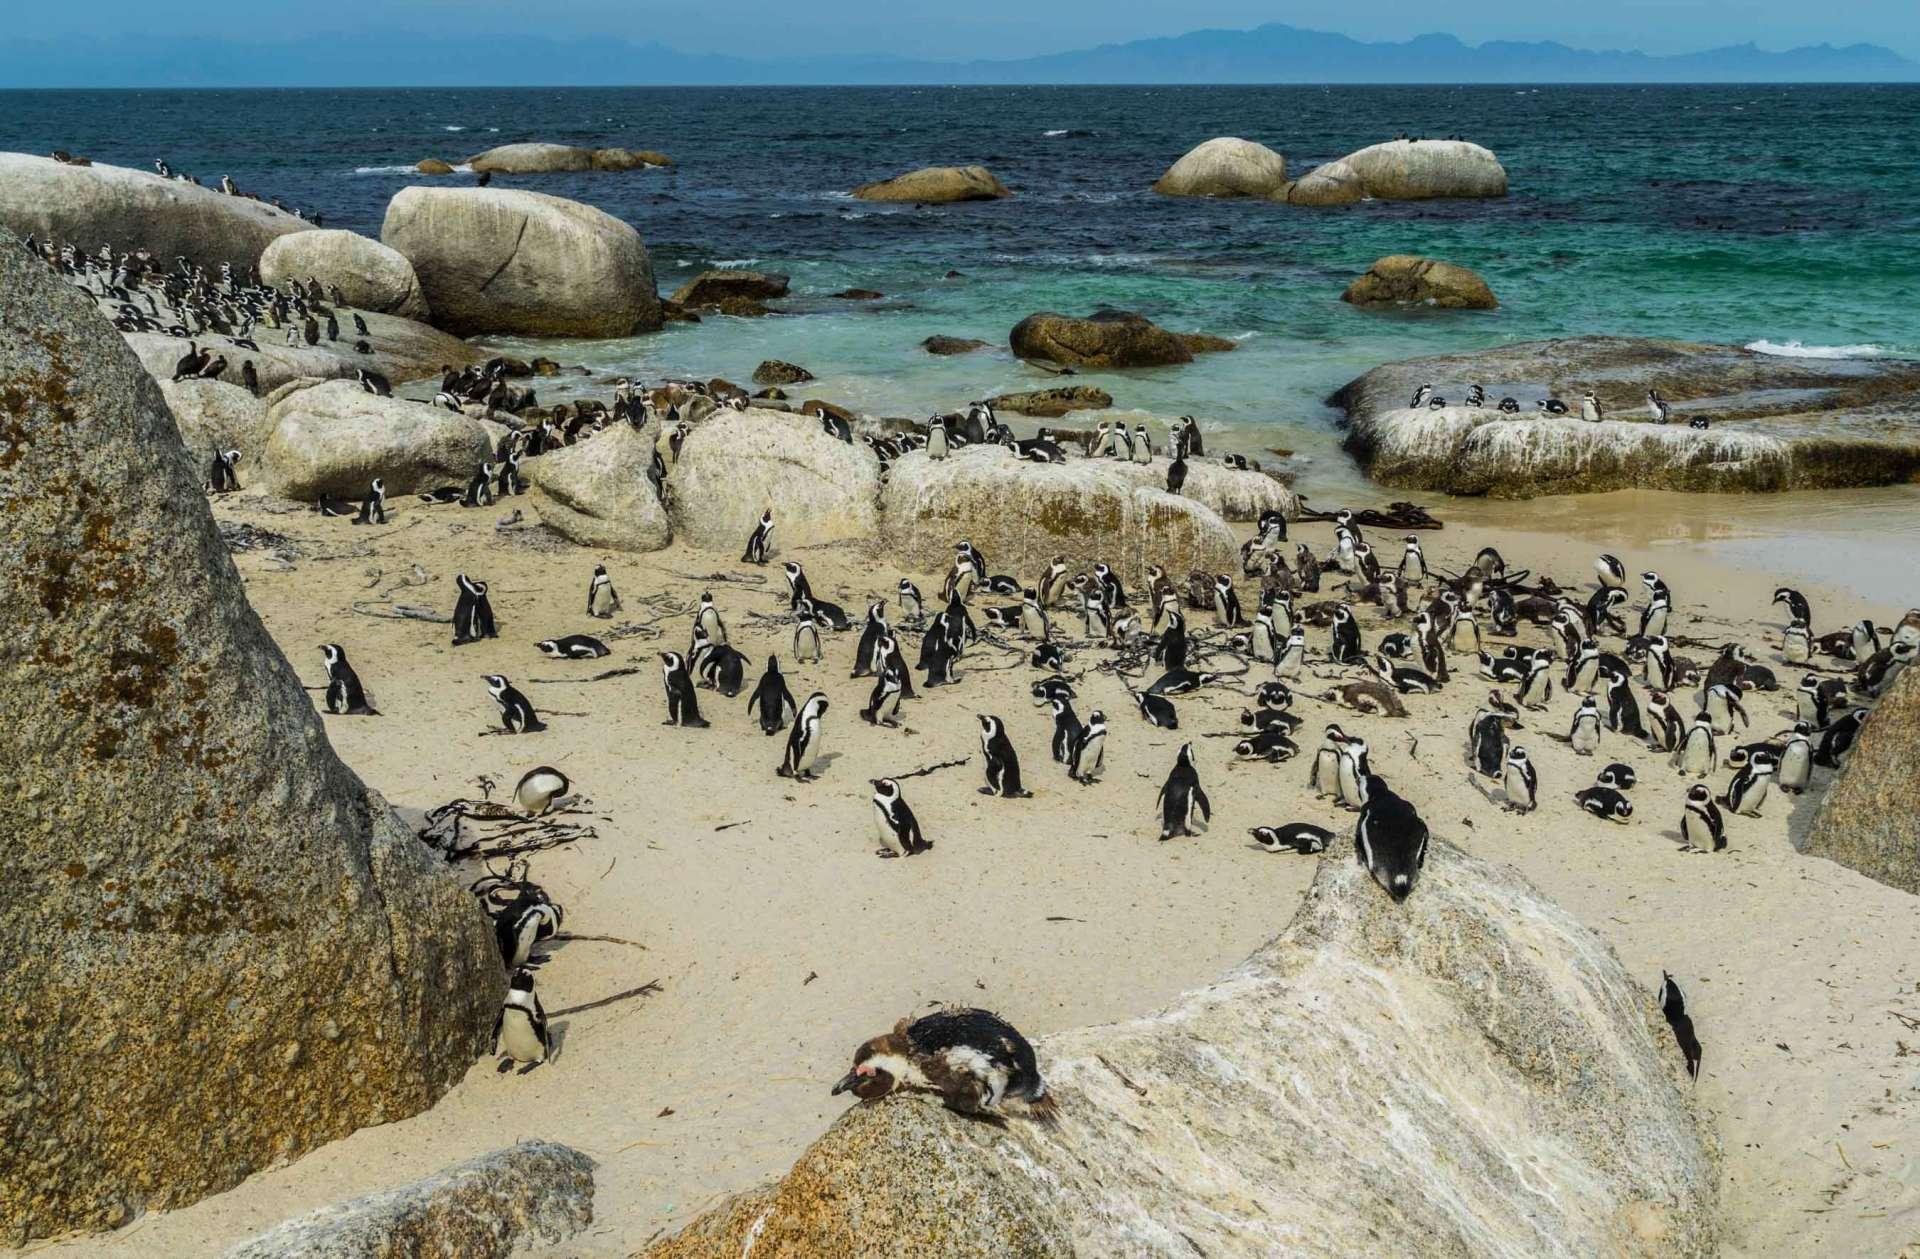 Cape Town Boulders Beach Pescart Enrico Pescantini 2